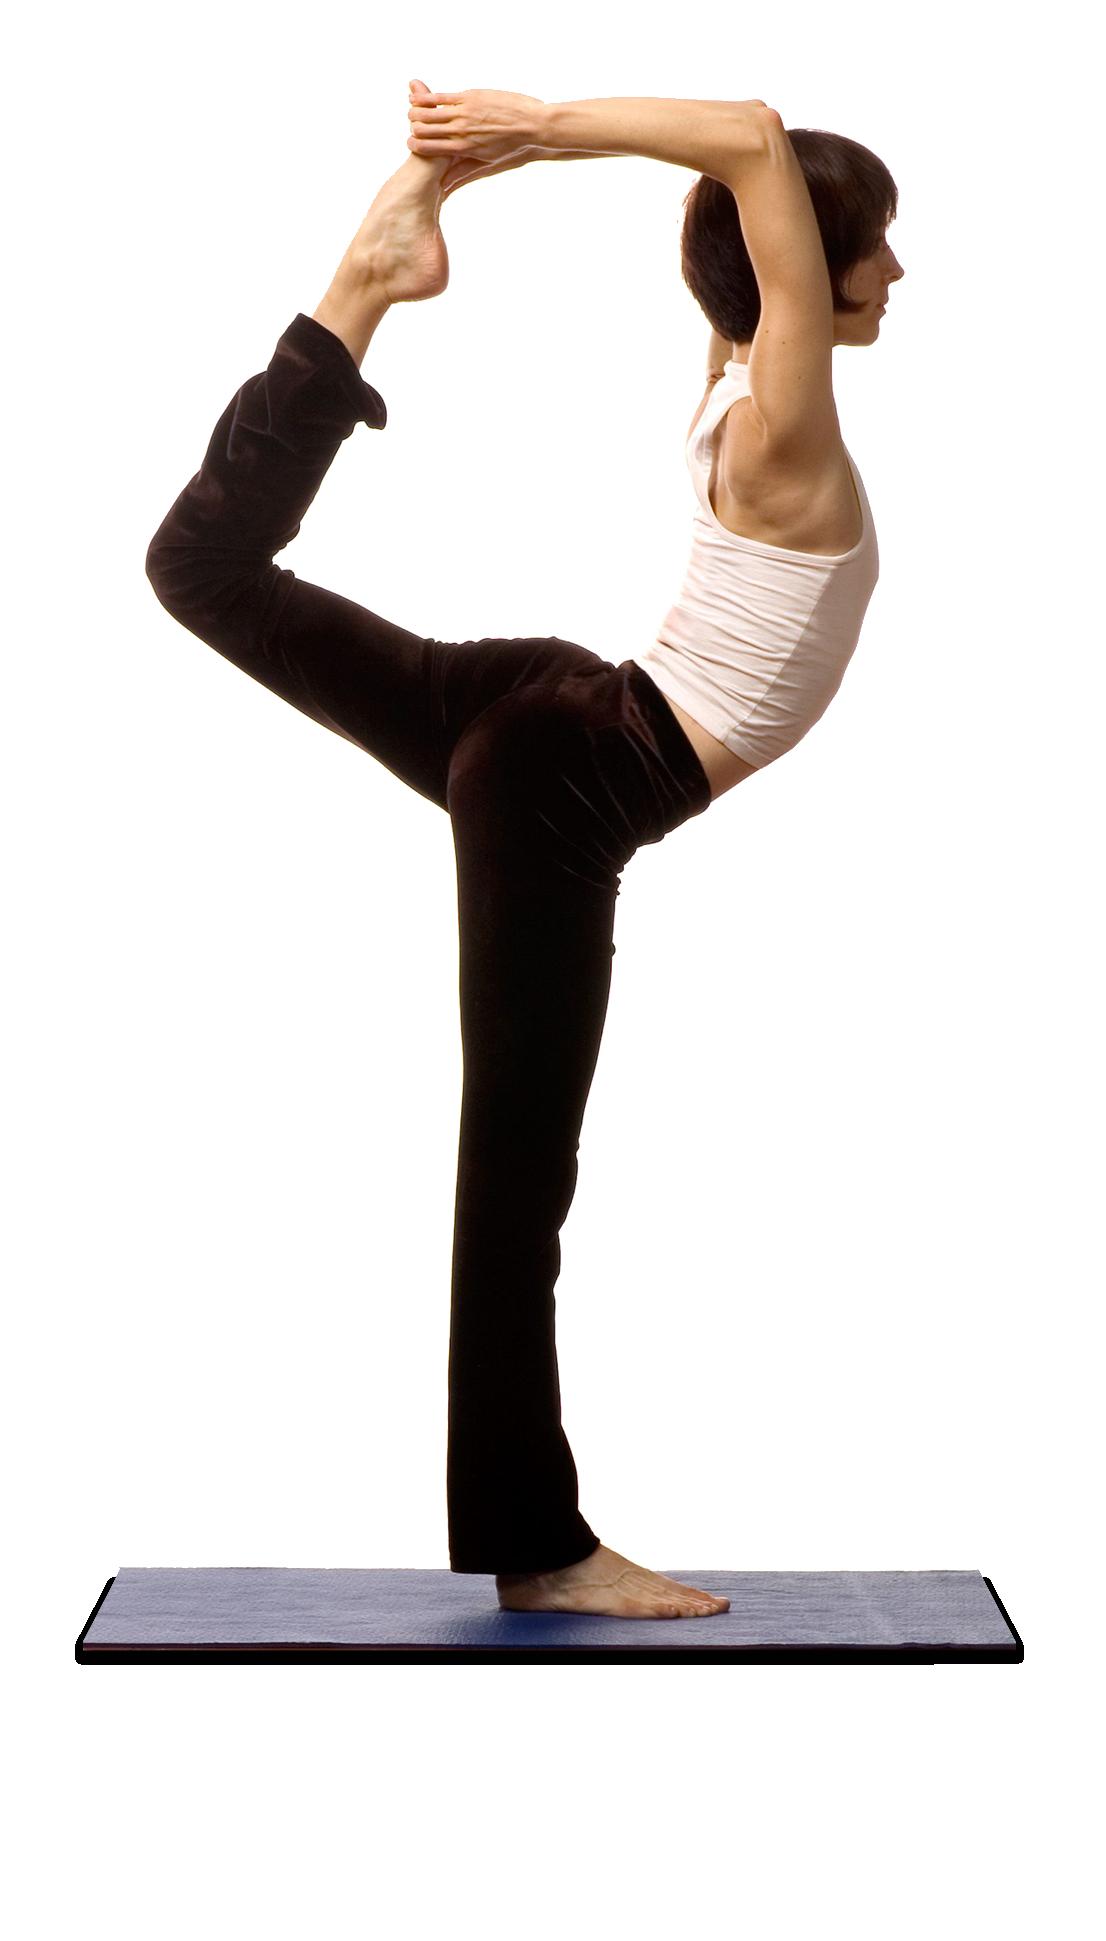 Citaten Filosofie Yoga : Samyama yoga opleidingen cursussen